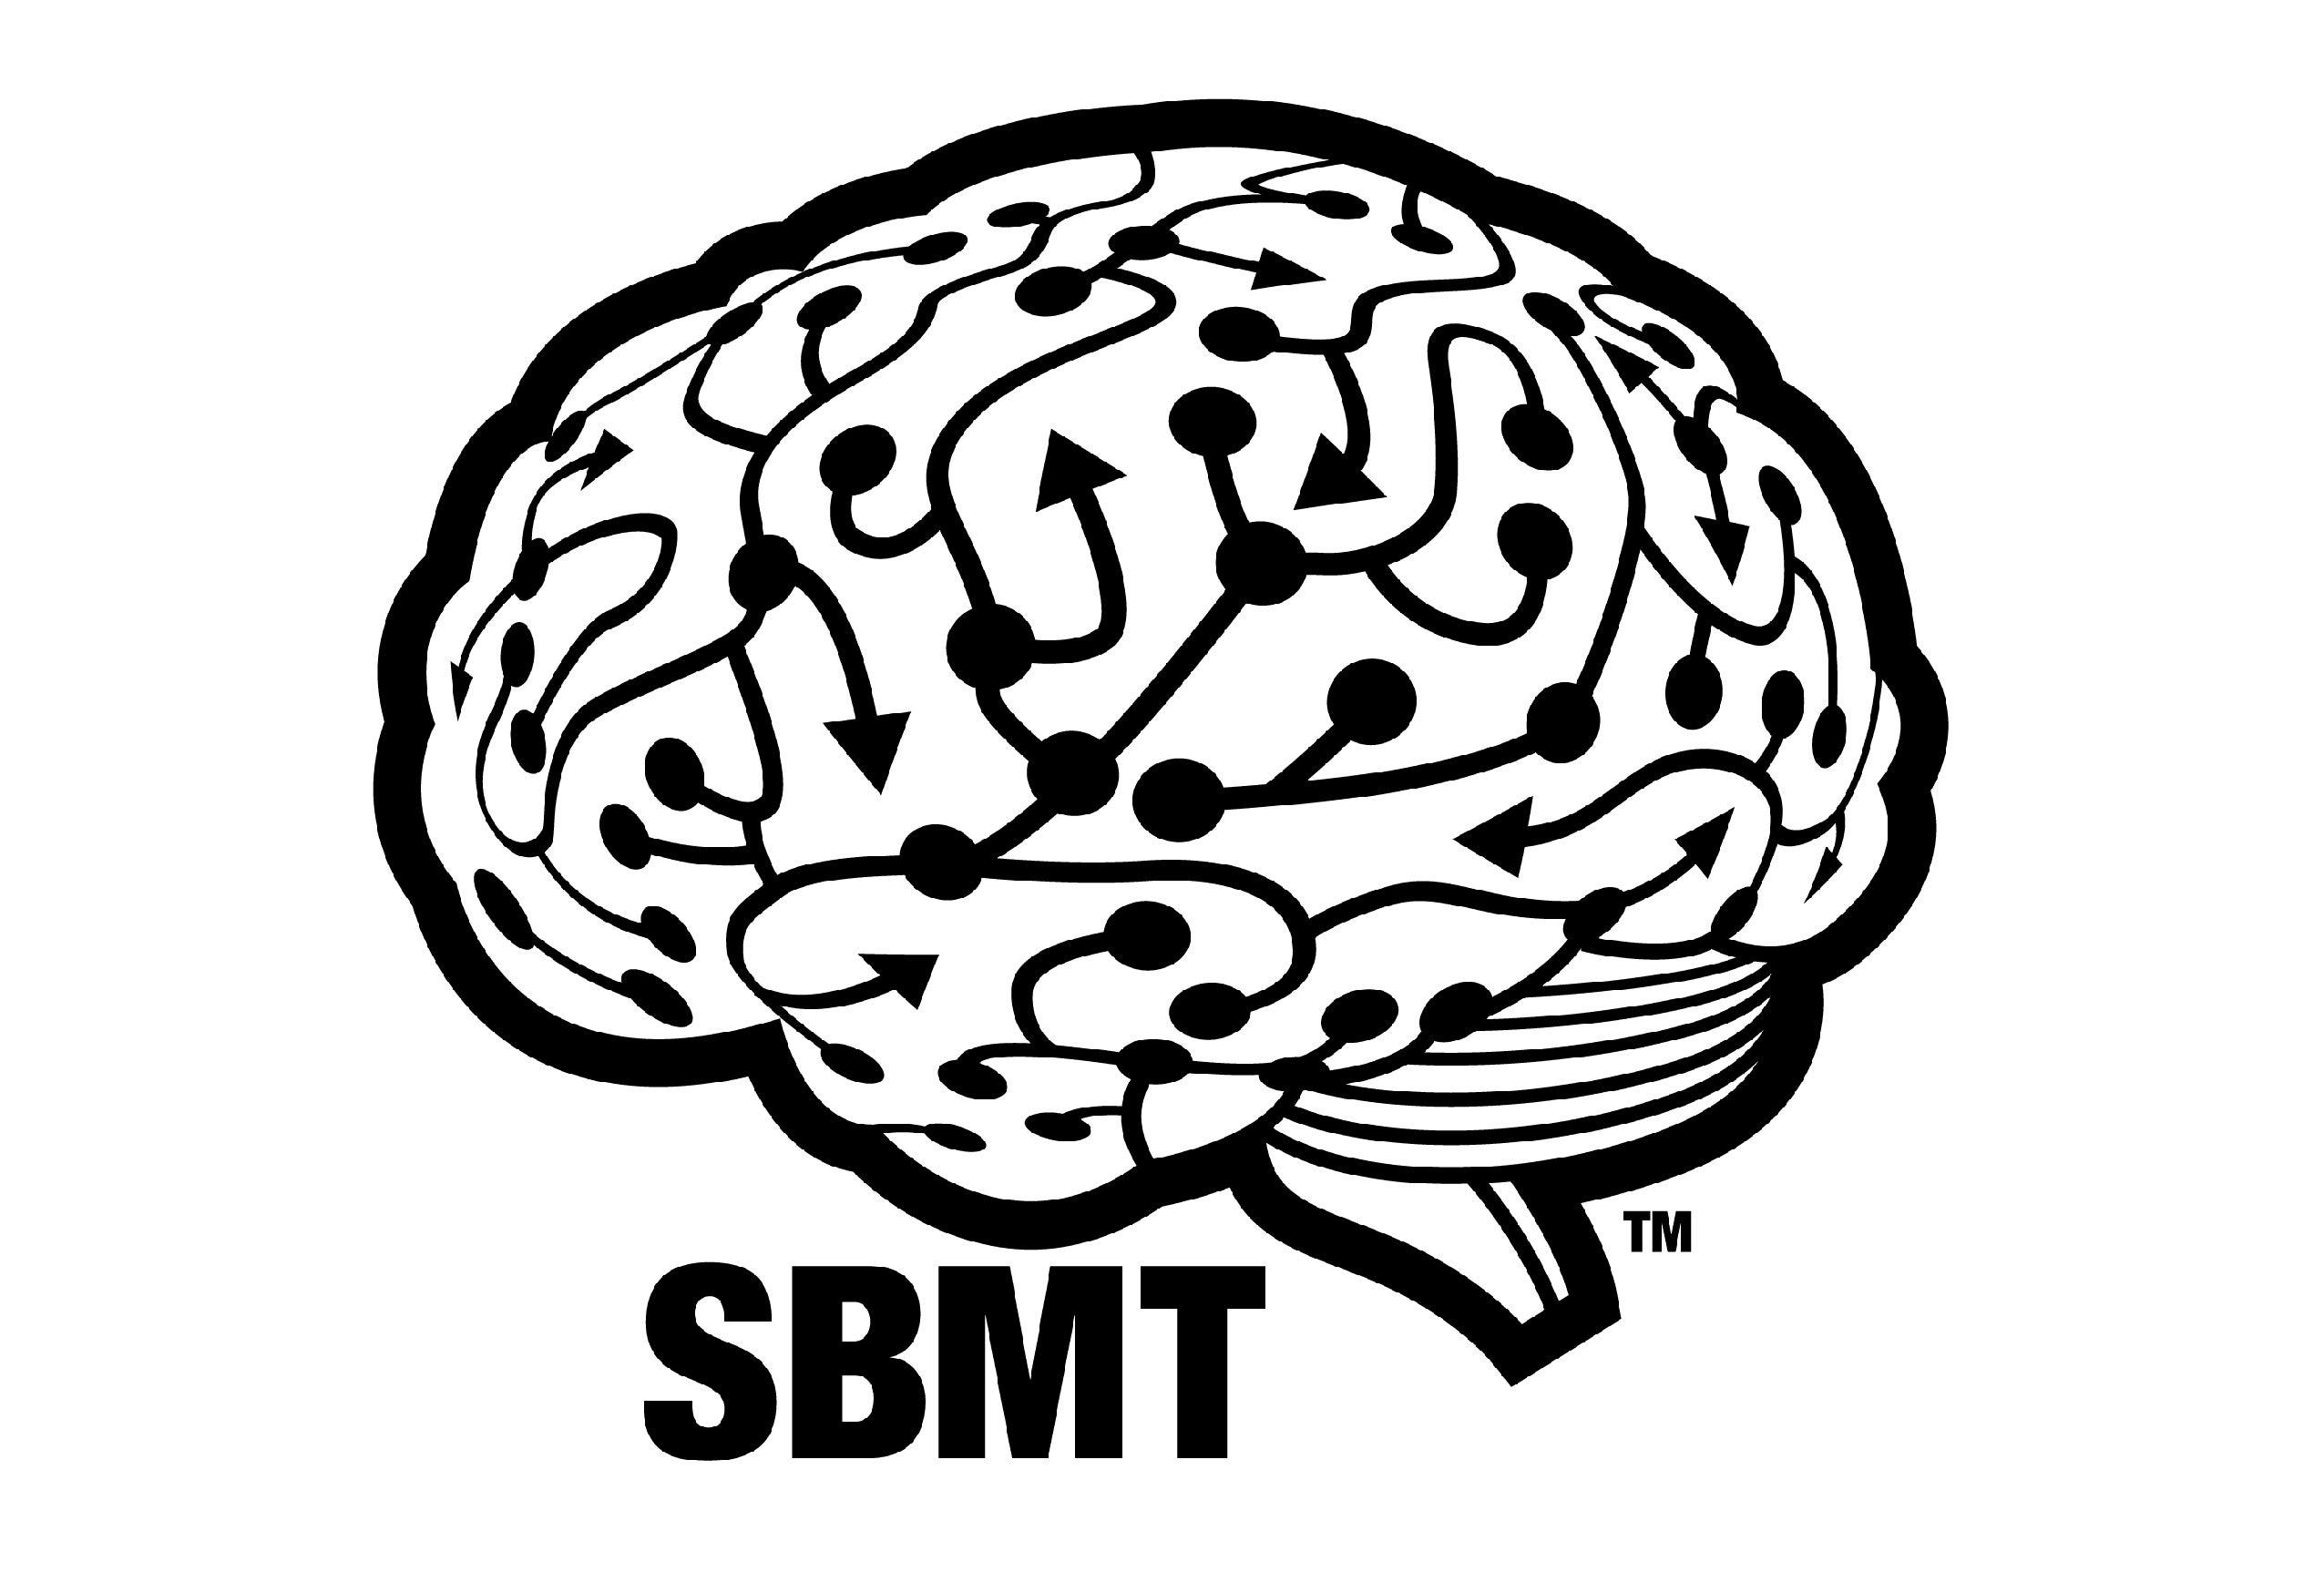 SBMT_logo_brain-01.jpg